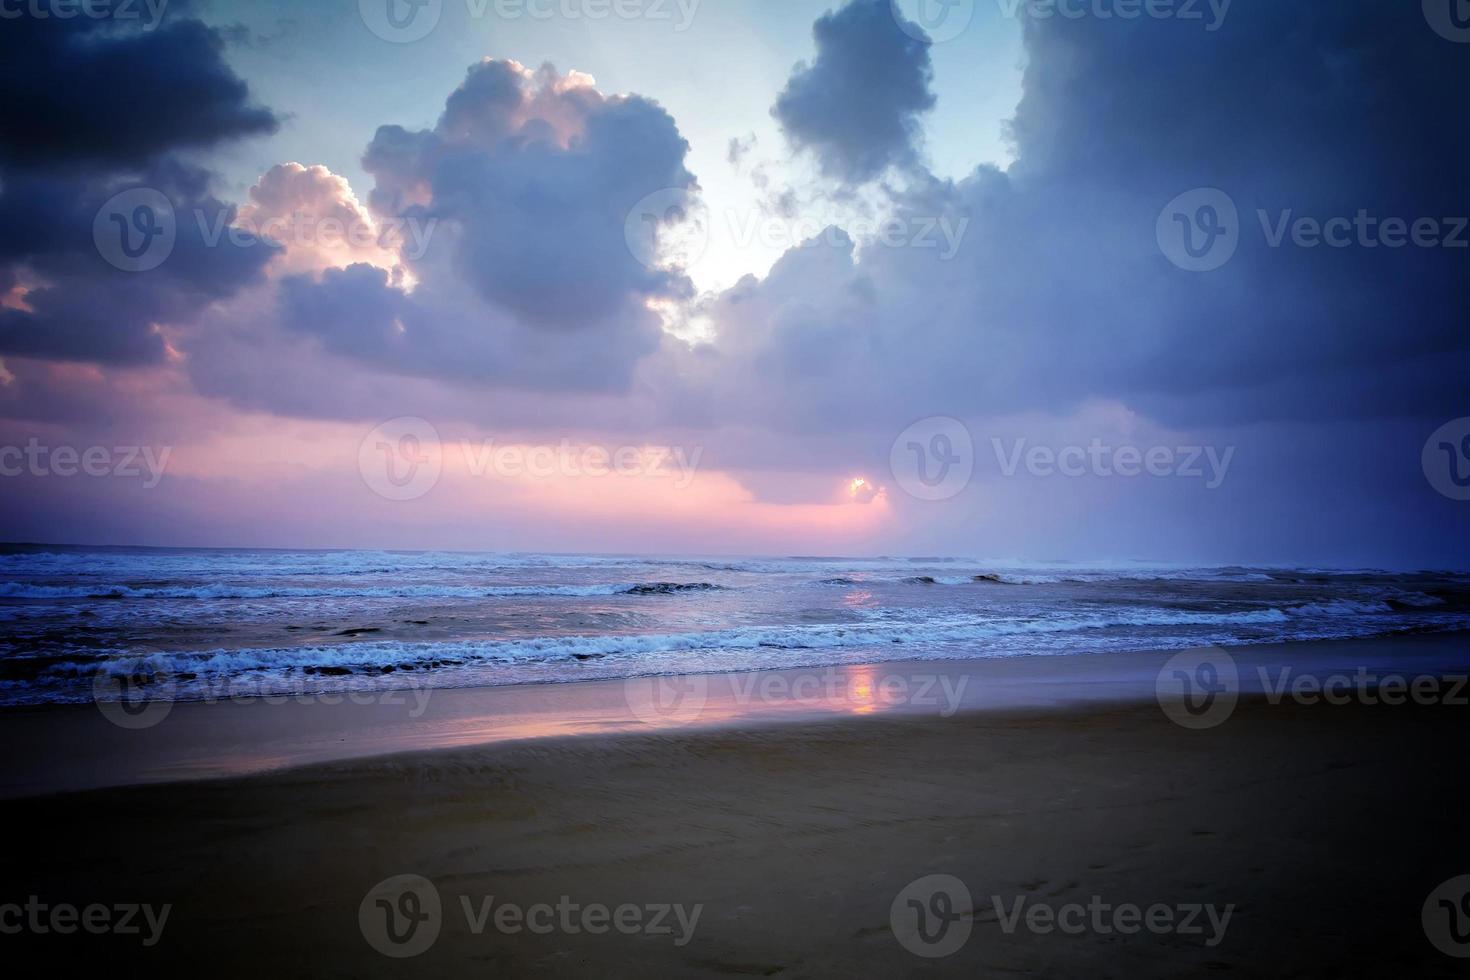 cloud sunset sky background photo